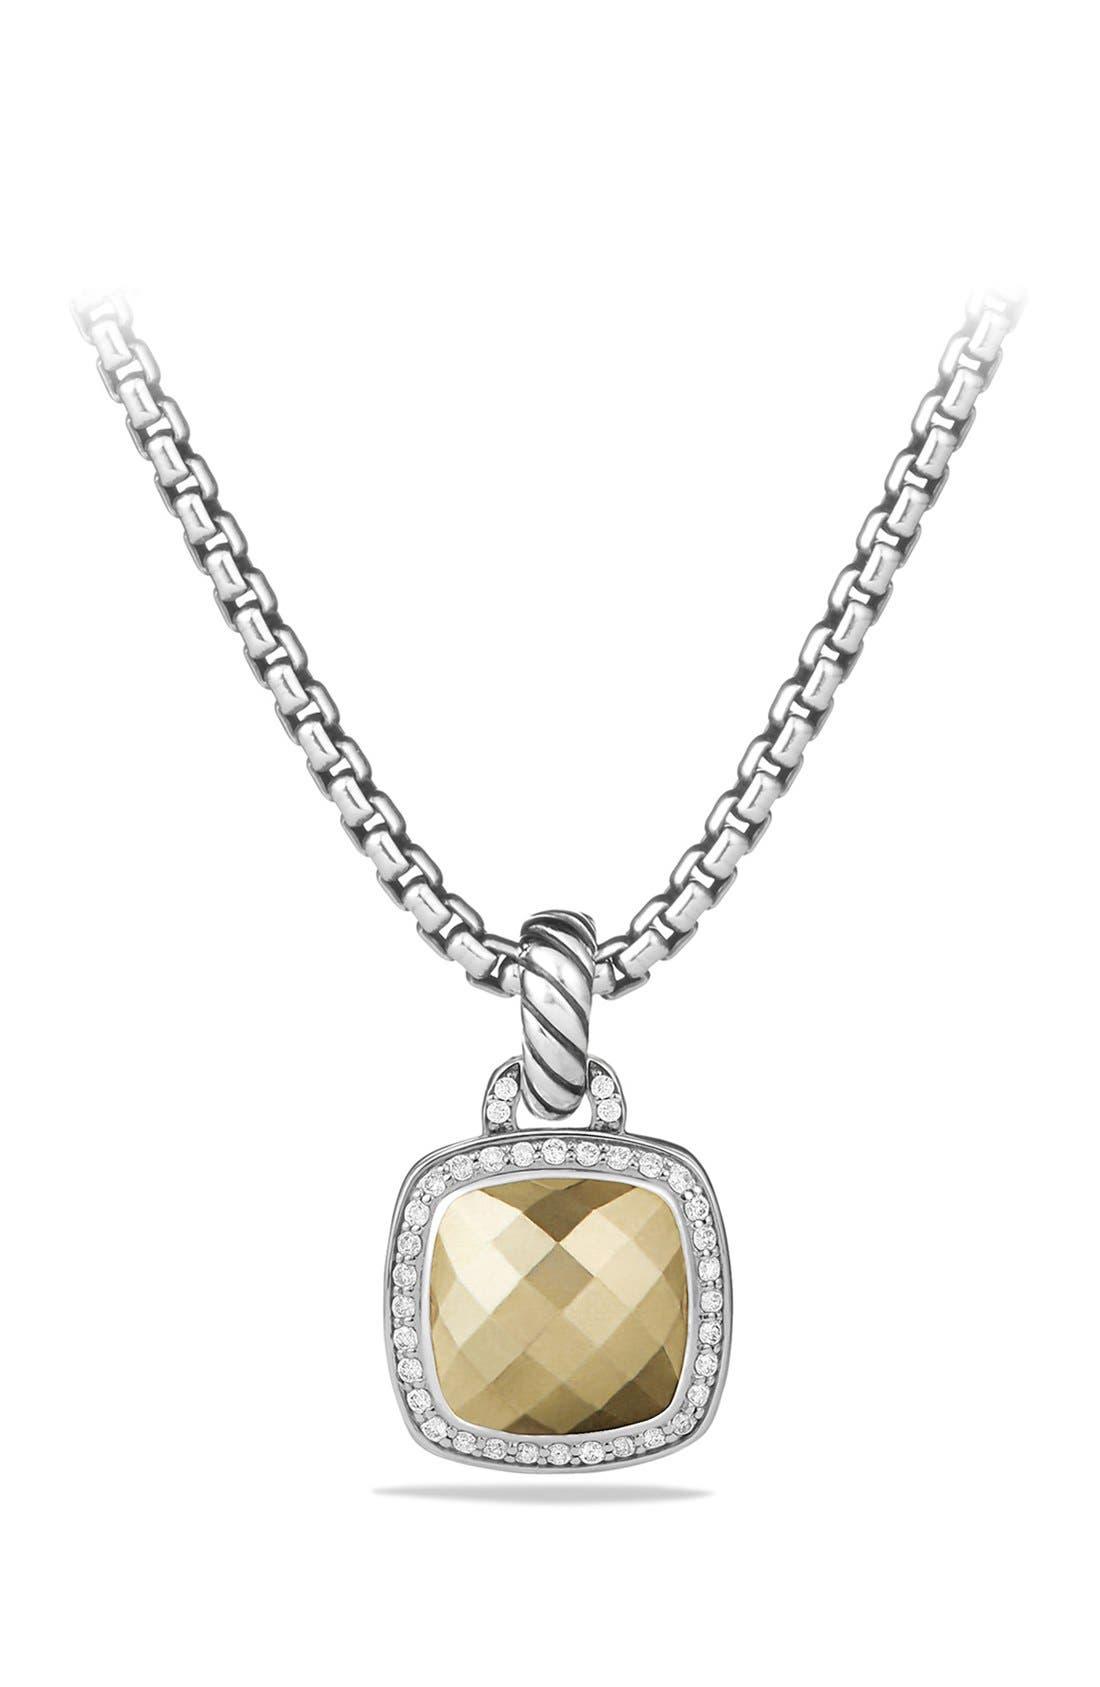 David Yurman'Albion' Pendant with Gold Dome and Diamonds